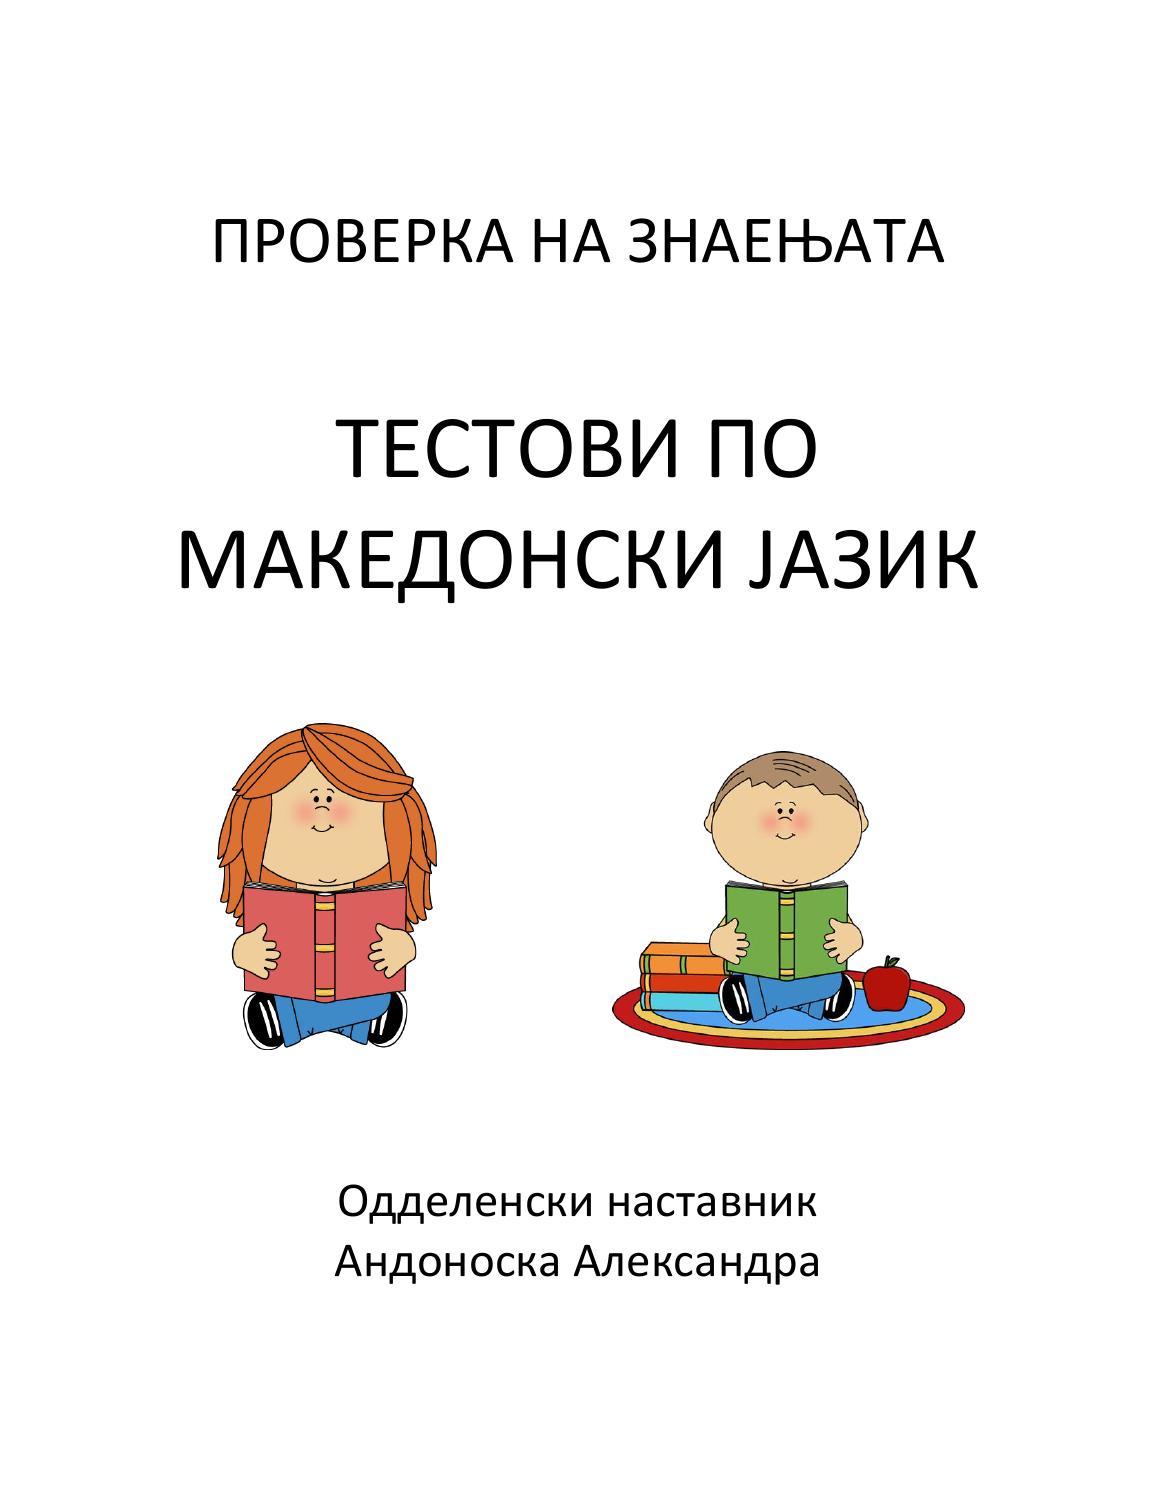 Македонски јазик by Aleksandra Andonoska - Issuu